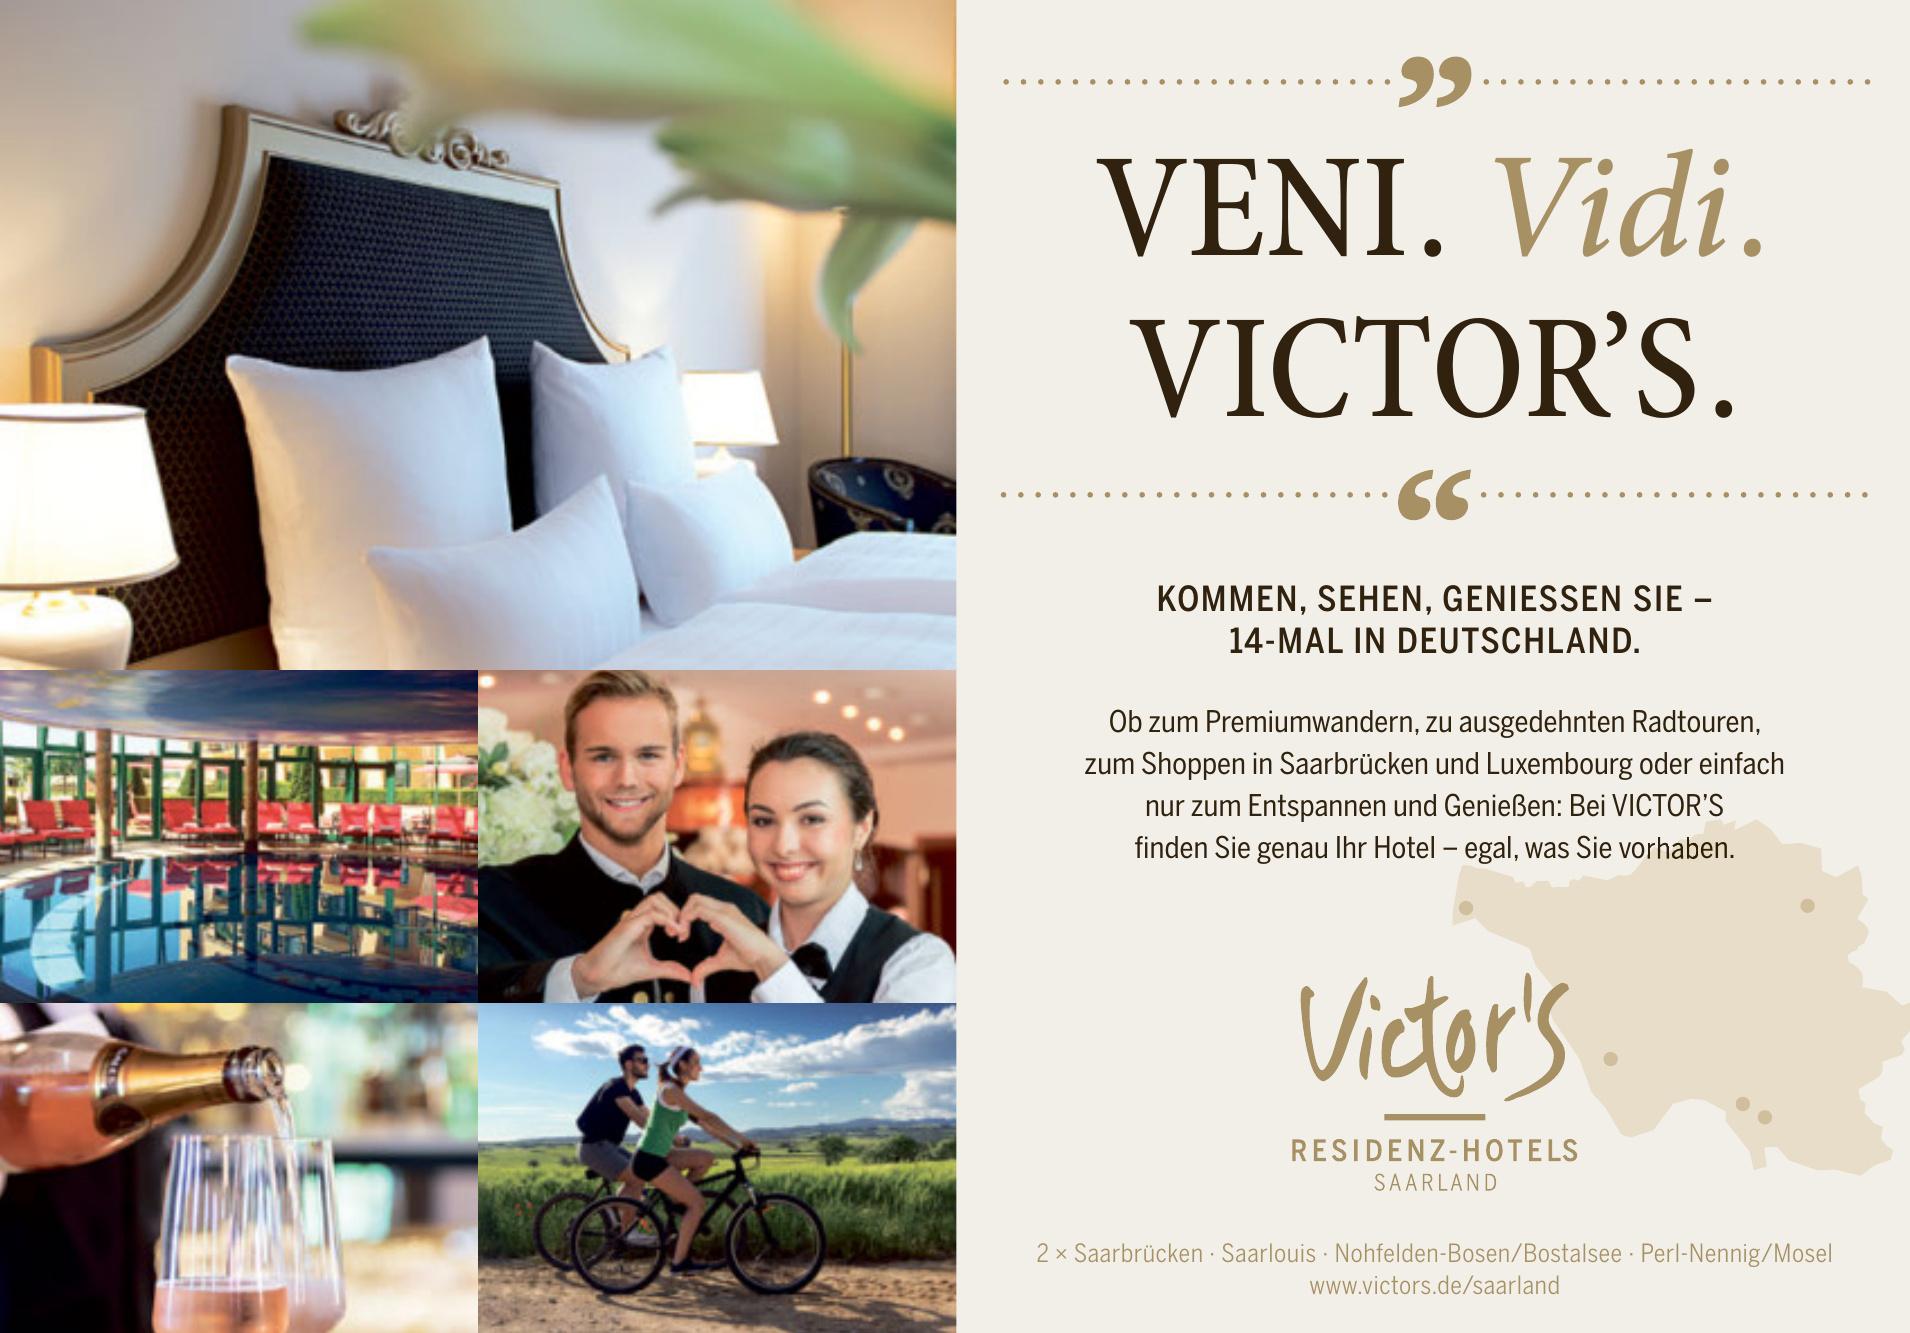 Victor´s Residenz Hotels Saarland